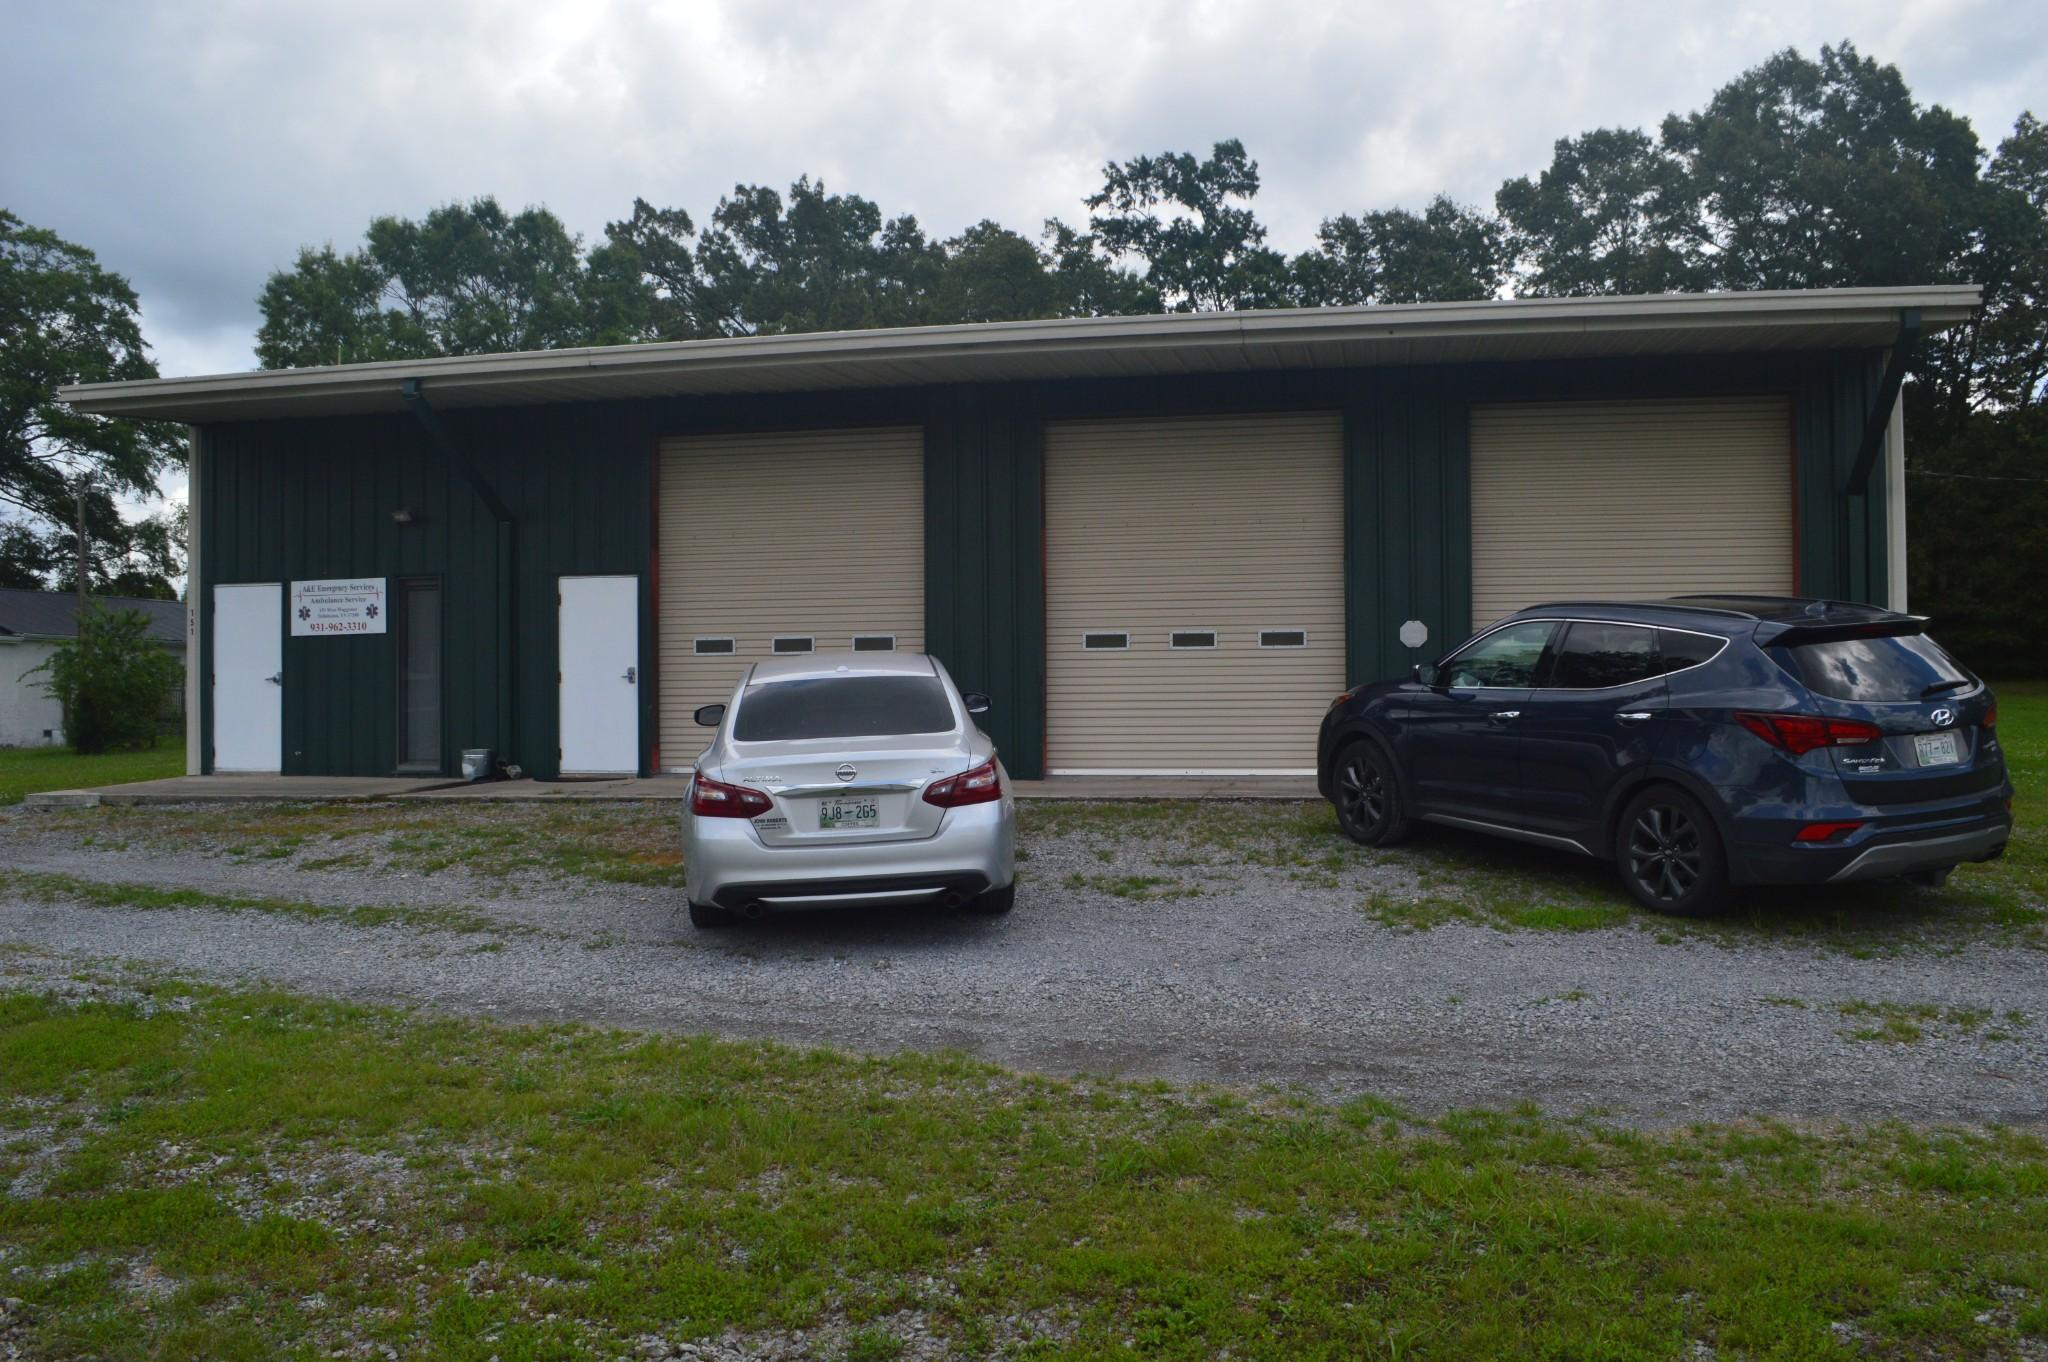 151 W Waggoner St Property Photo - Tullahoma, TN real estate listing